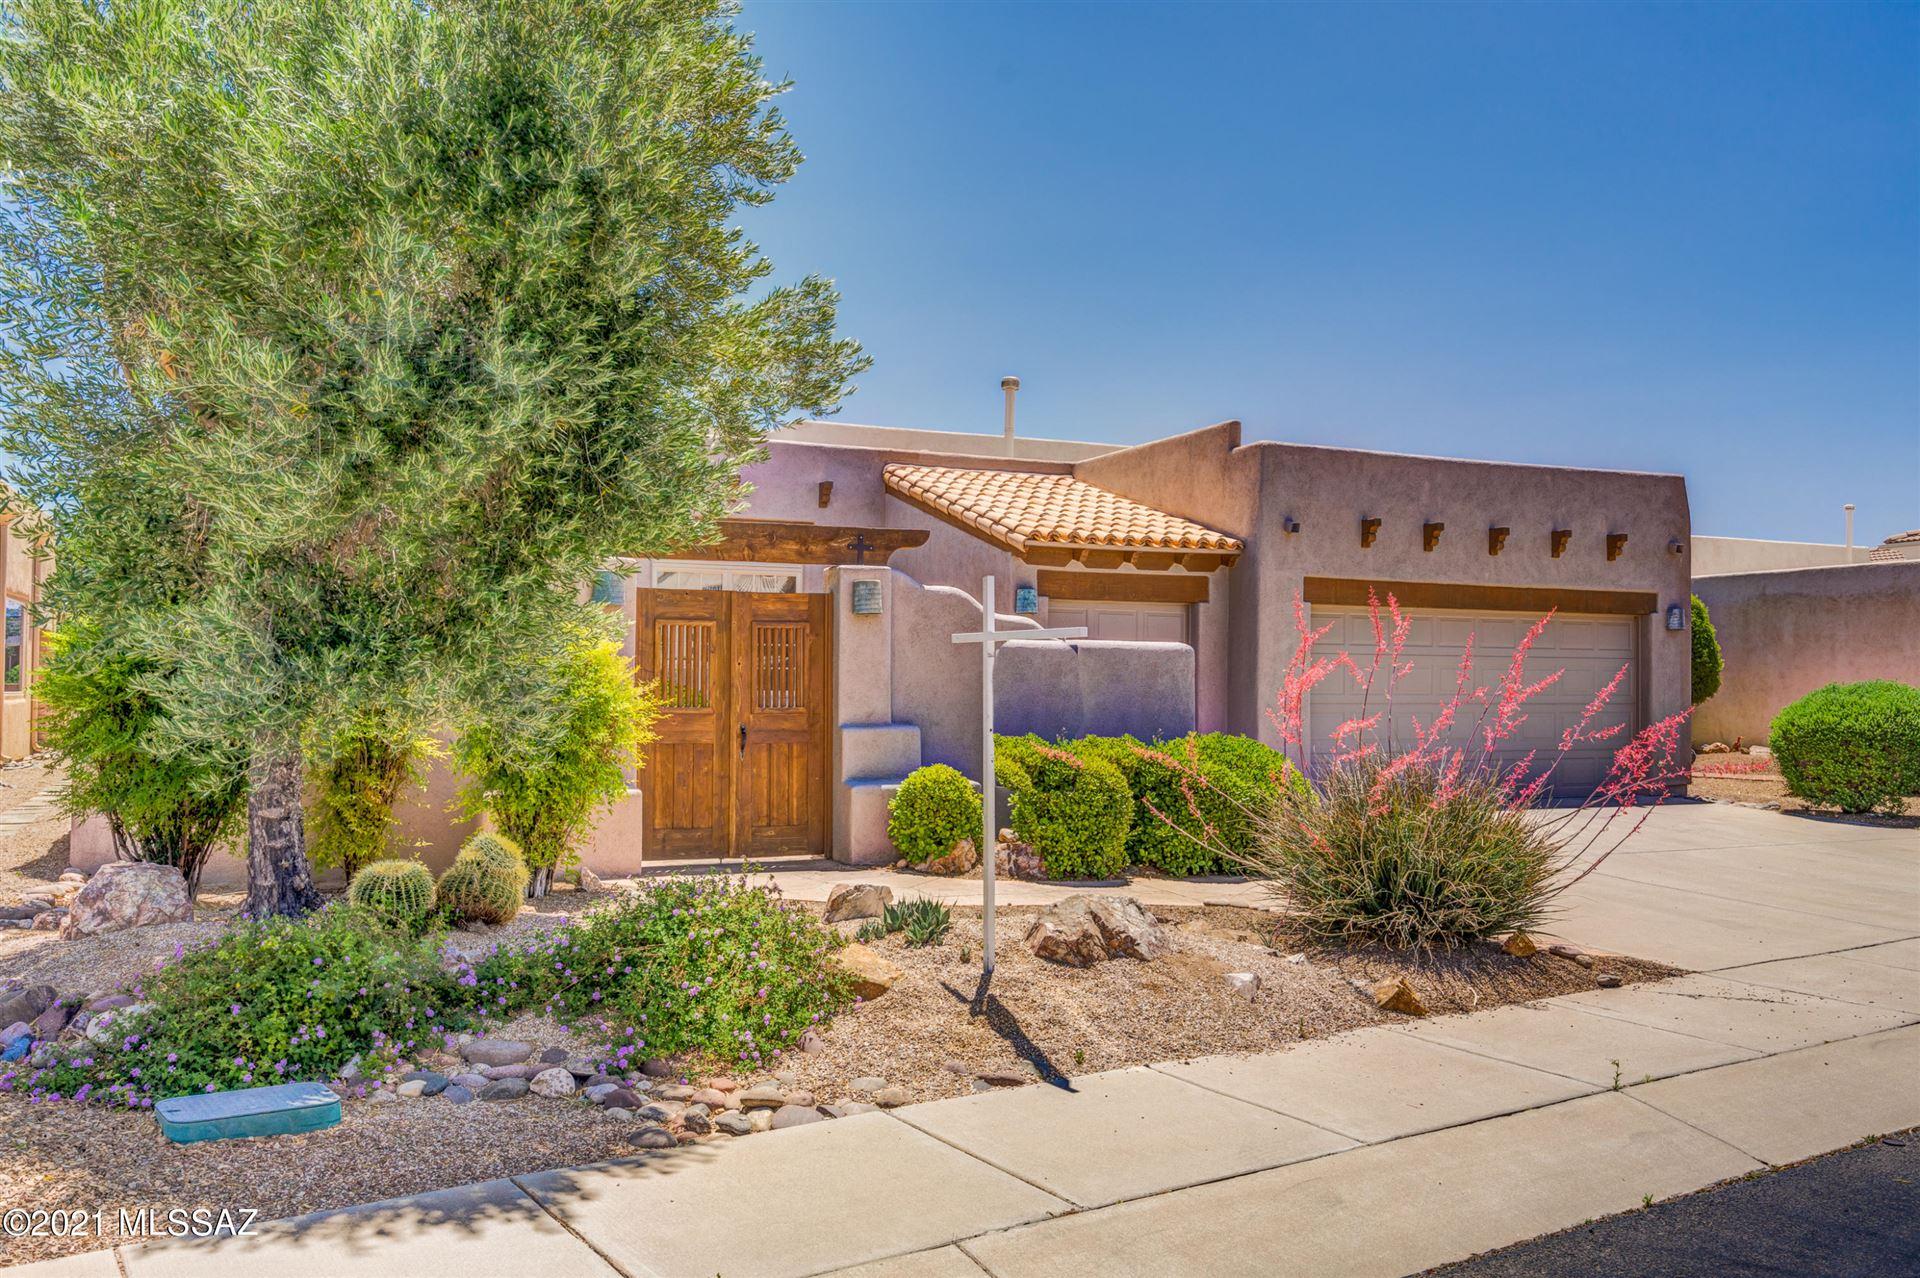 2791 S Fade Drive, Green Valley, AZ 85614 - MLS#: 22108250